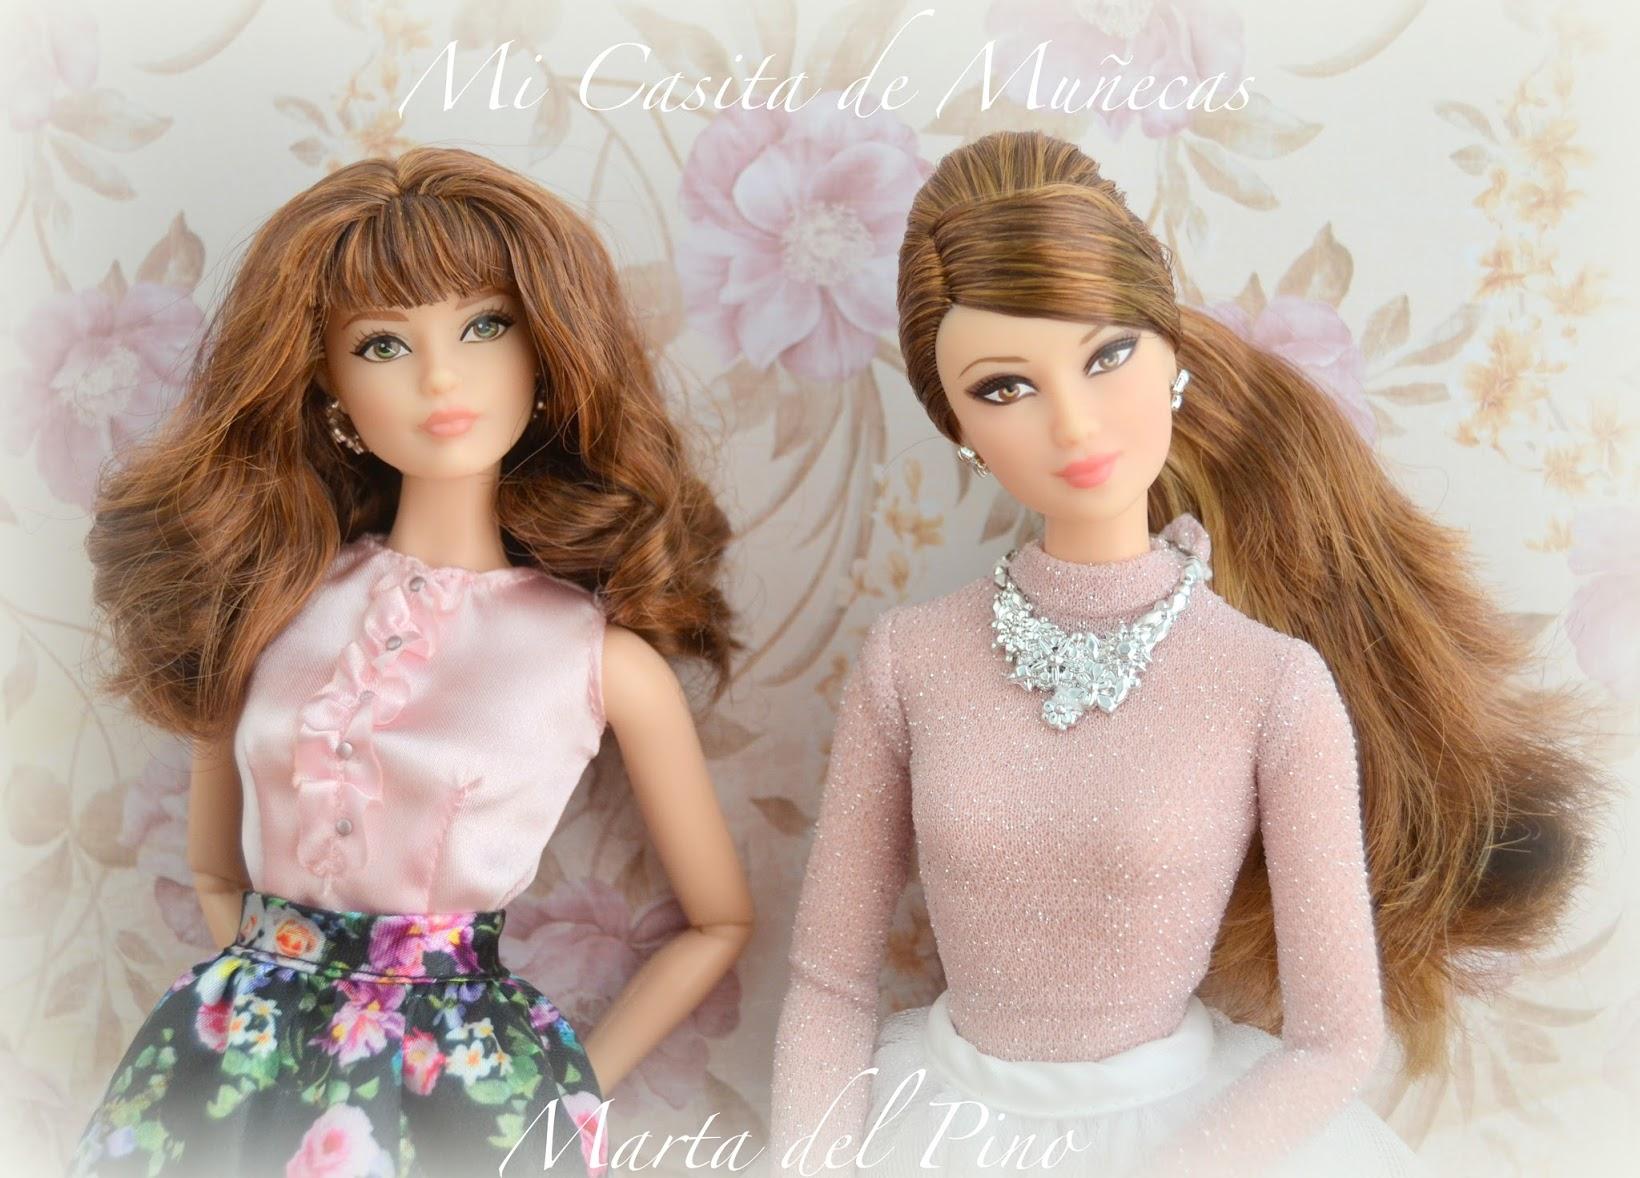 Barbie Look 2016, Sweet Tea, Perfect Party, facial sculpt Karl Lagerfeld Lea, molde de cara, pivotal, Mi casita de muñecas, Marta del Pino